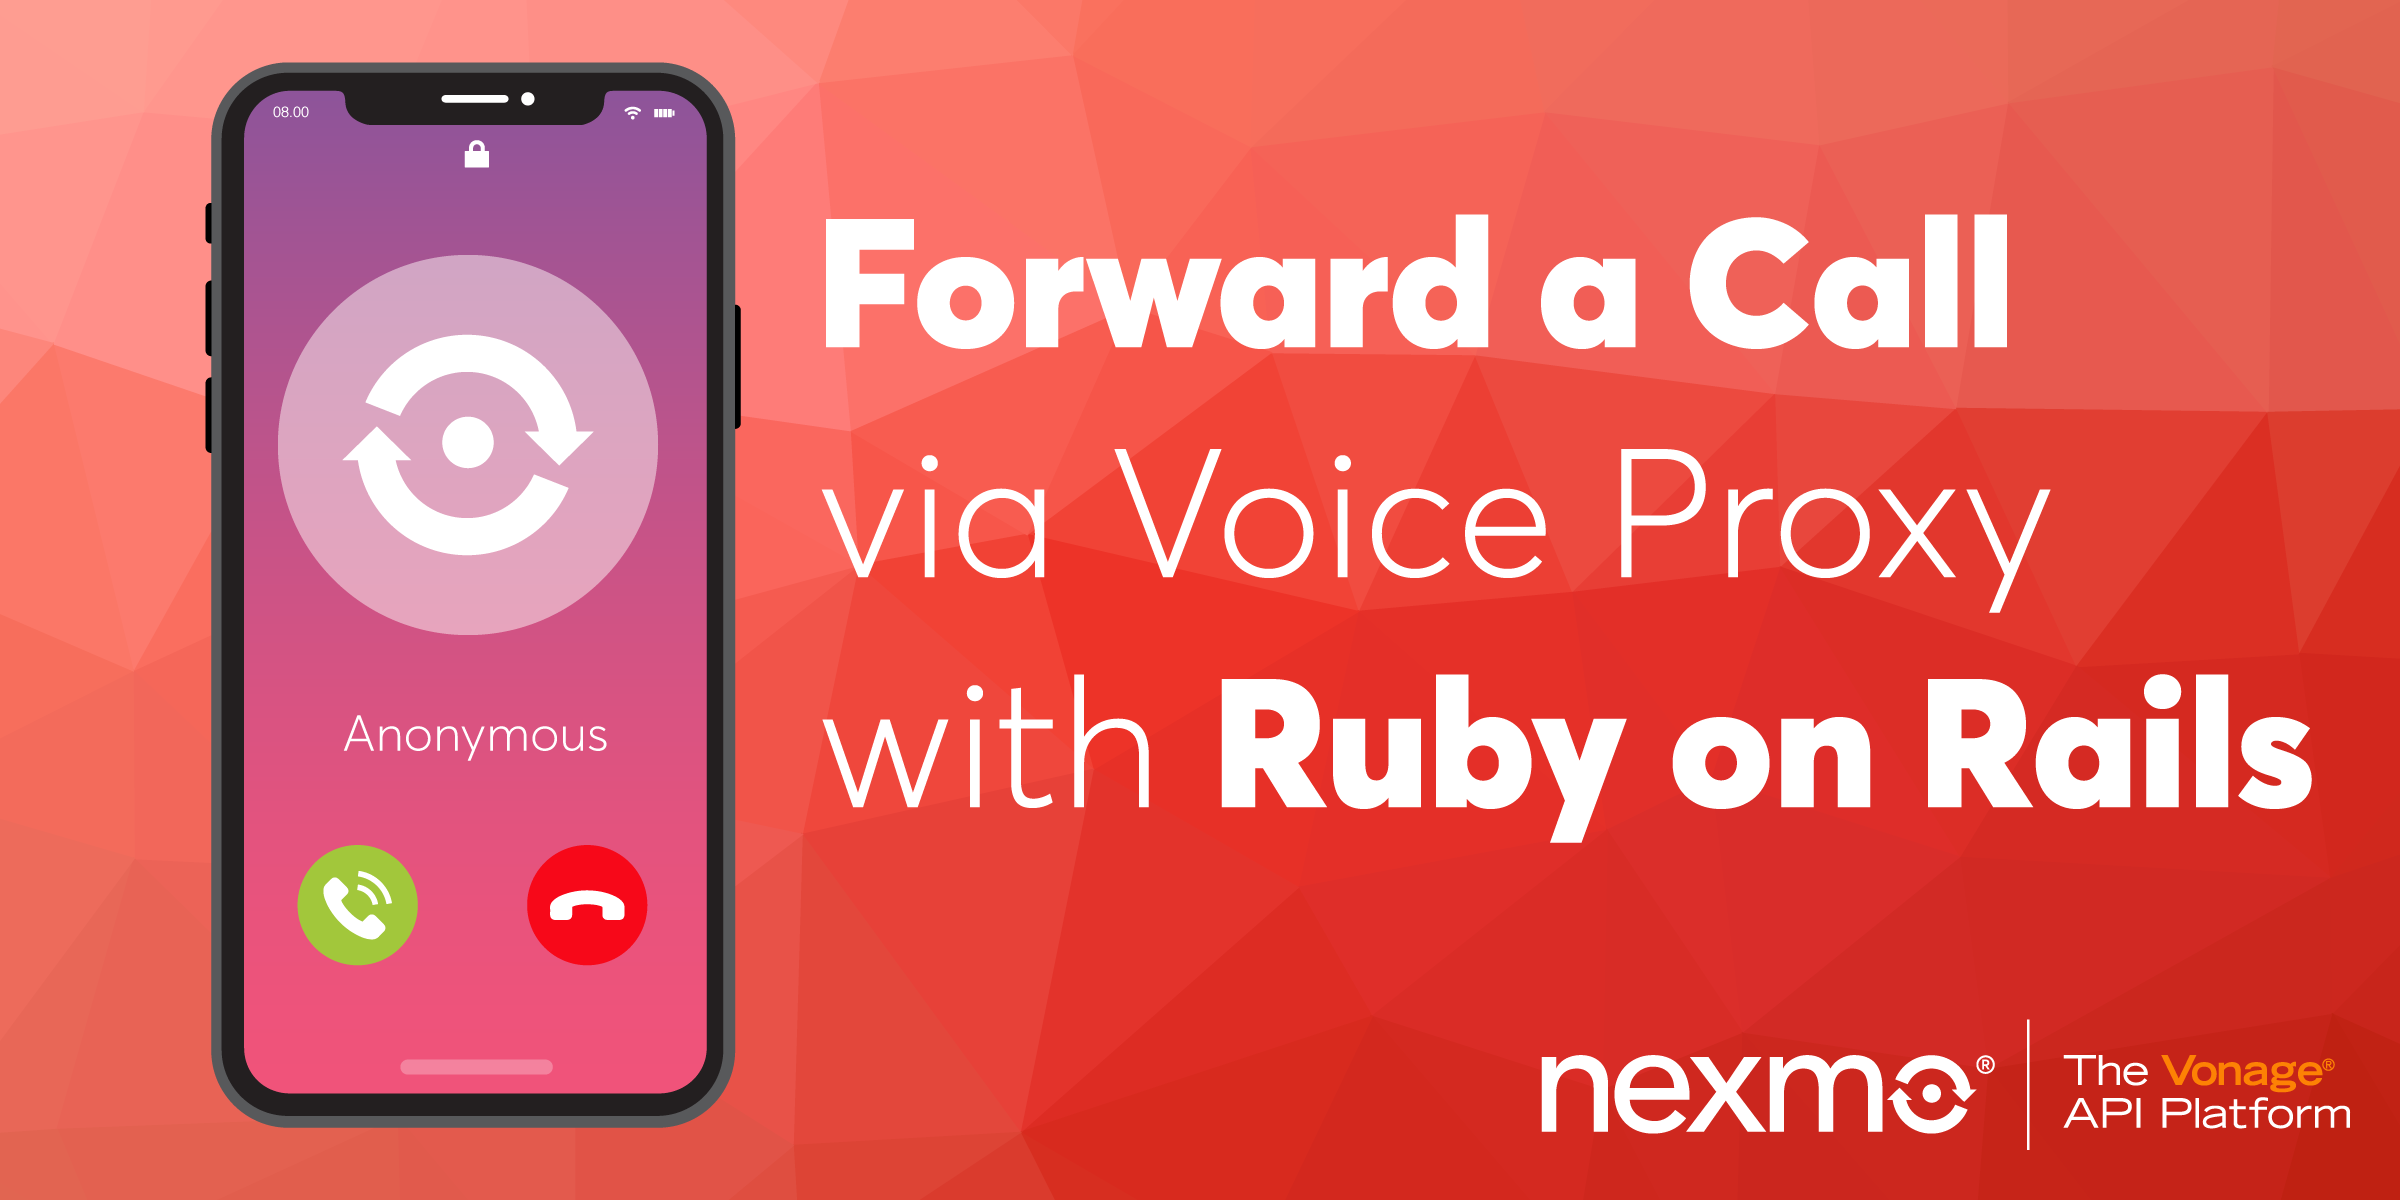 Forward a Call via Voice Proxy with Ruby on Rails